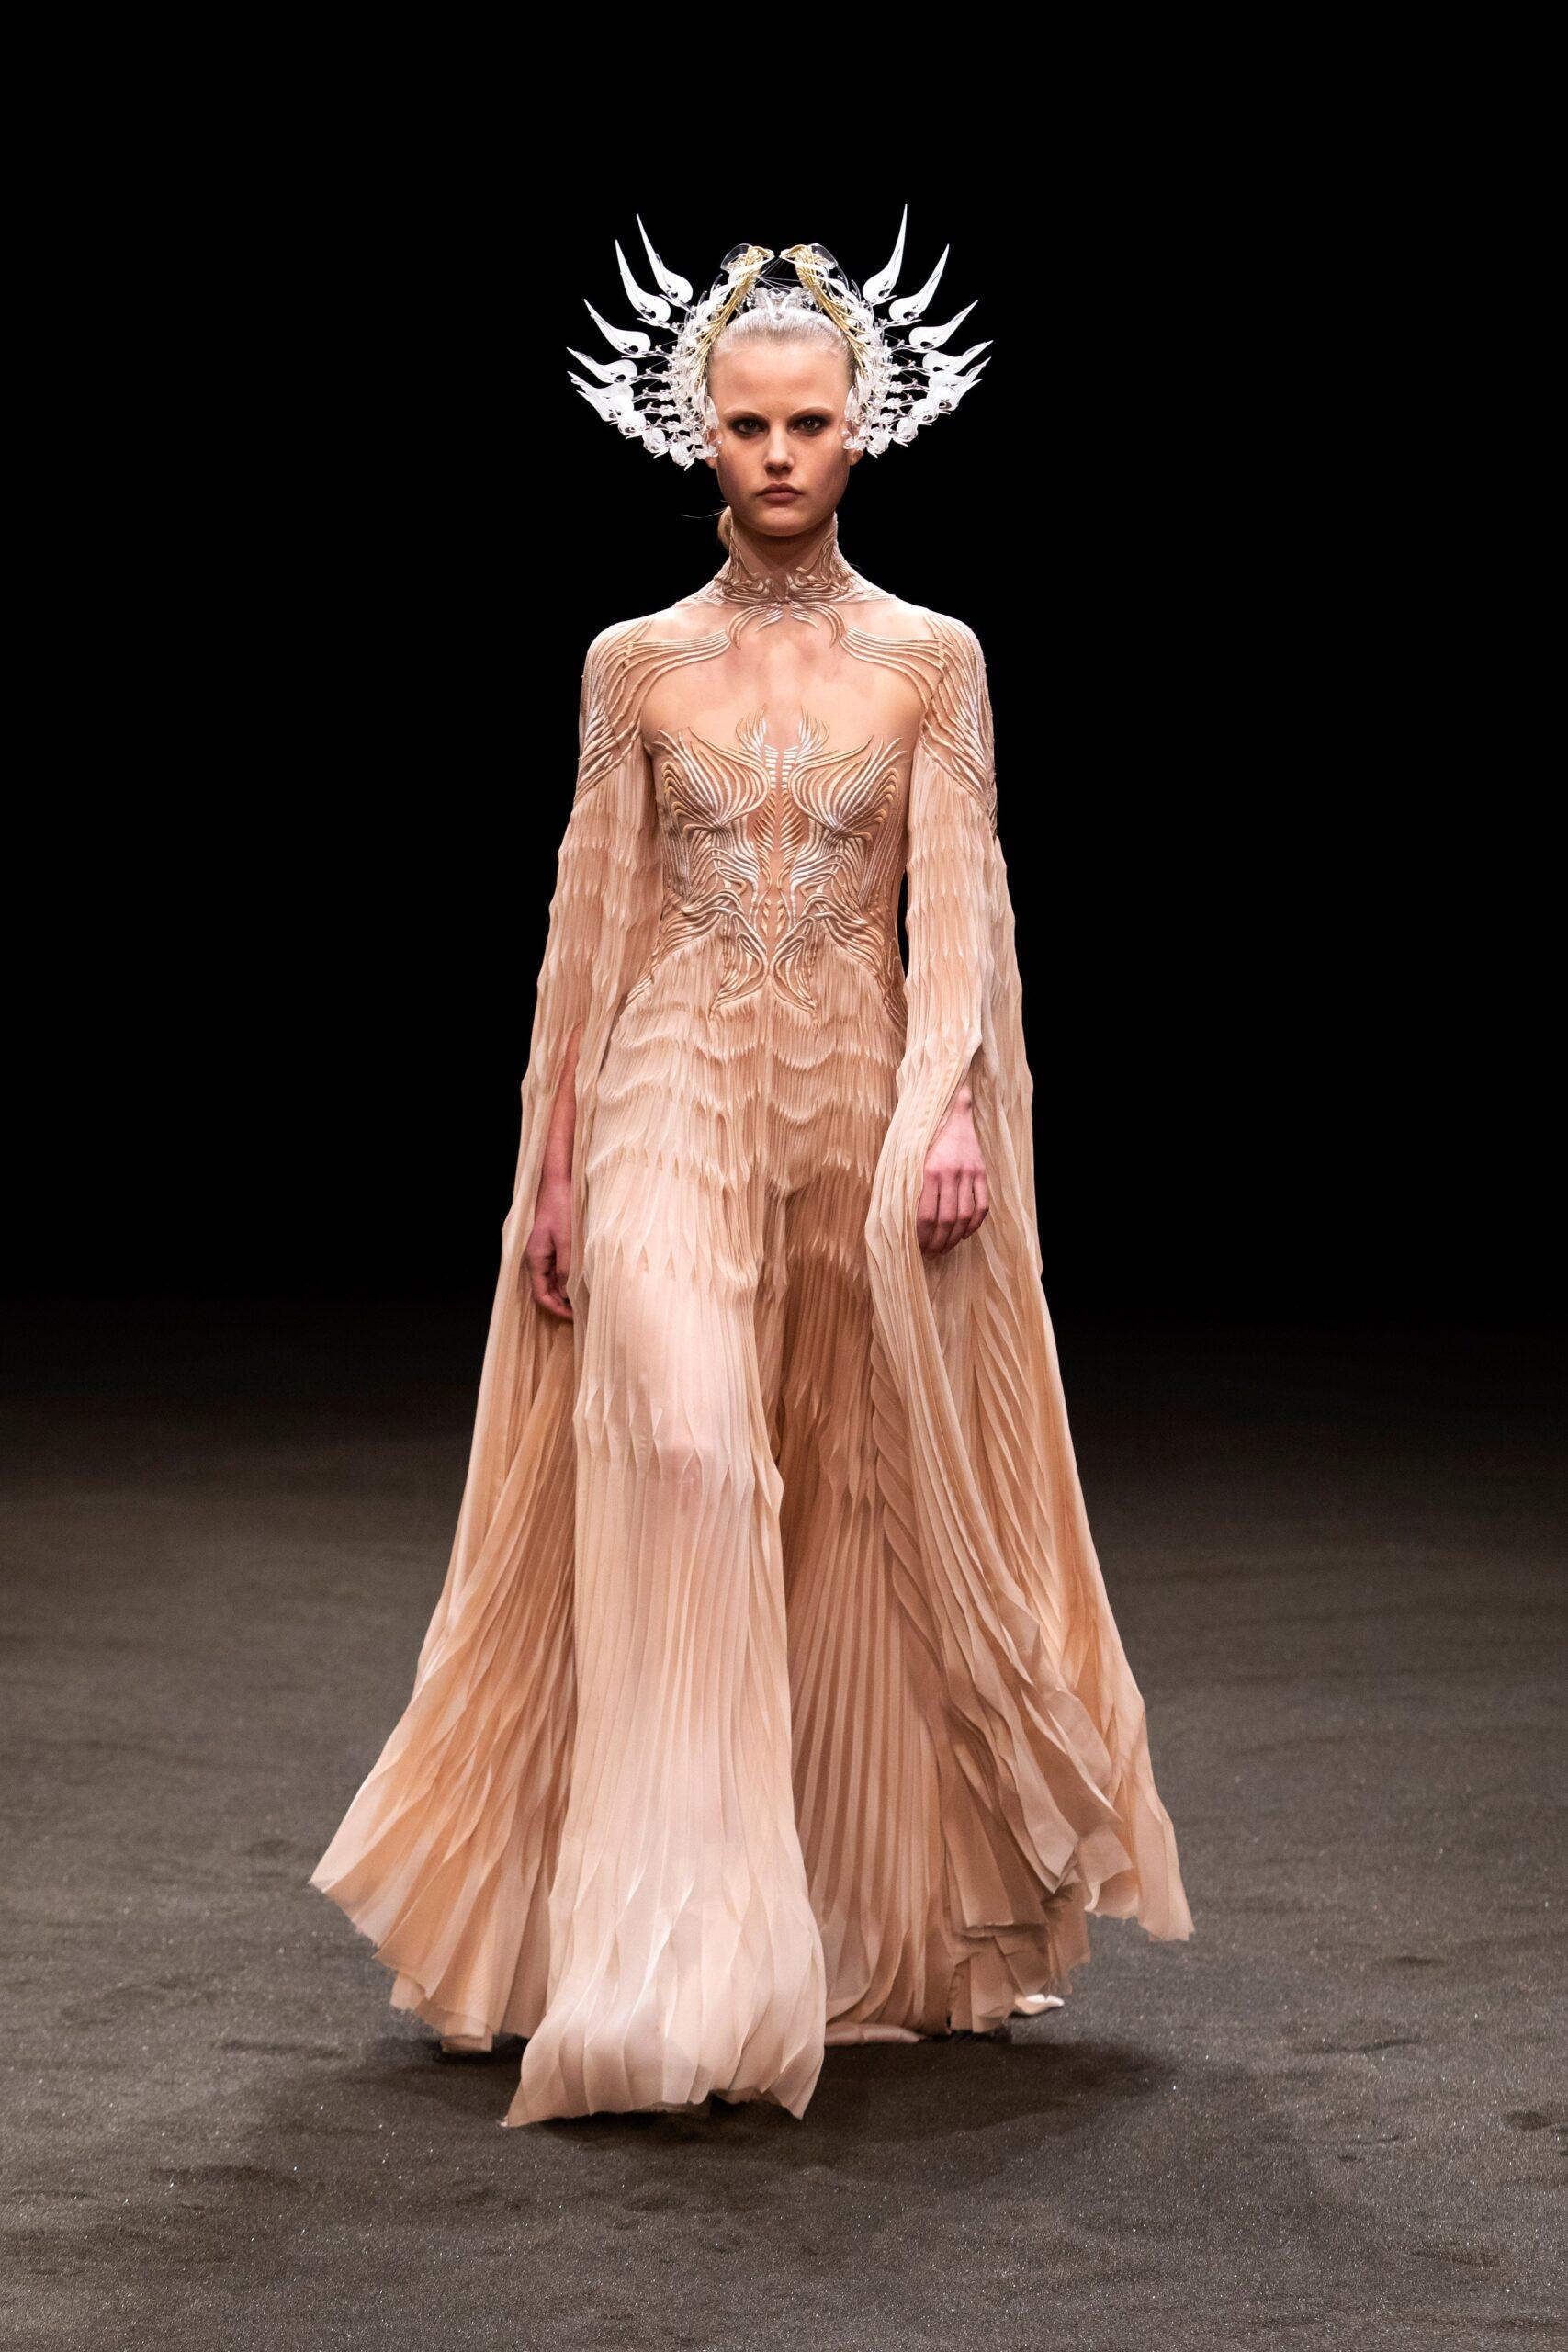 00010 Iris van Herpen Couture Spring 21 credit Gio Staiano